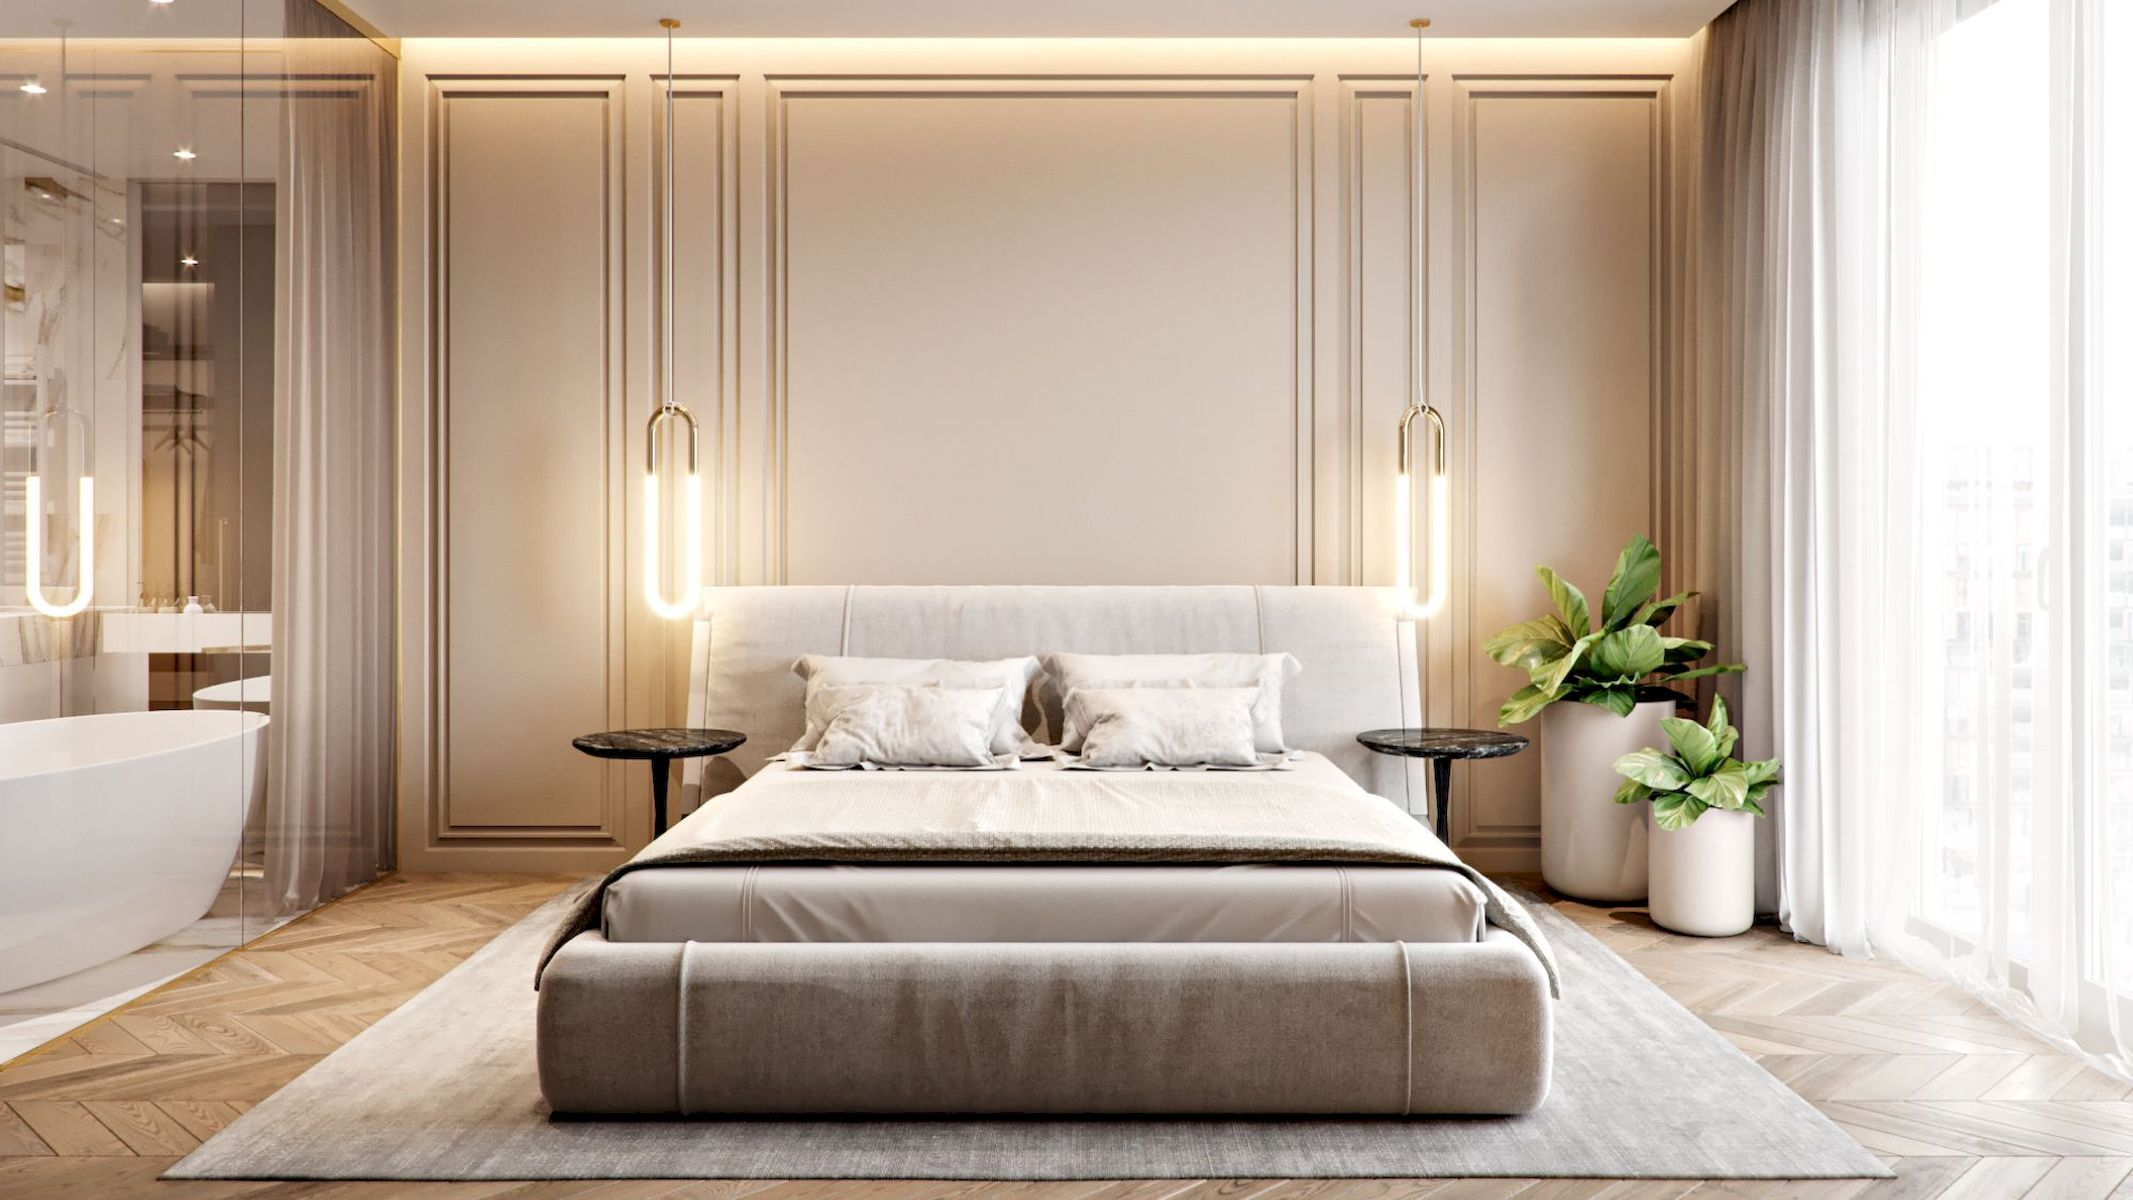 Nice Stunning Bedroom Lighting Ideashttps Jihanshanum Com Stunning Bedroom Lighting Ideas Classic Bedroom Modern Classic Bedroom Bedroom Interior Gold plated luxury bedroom